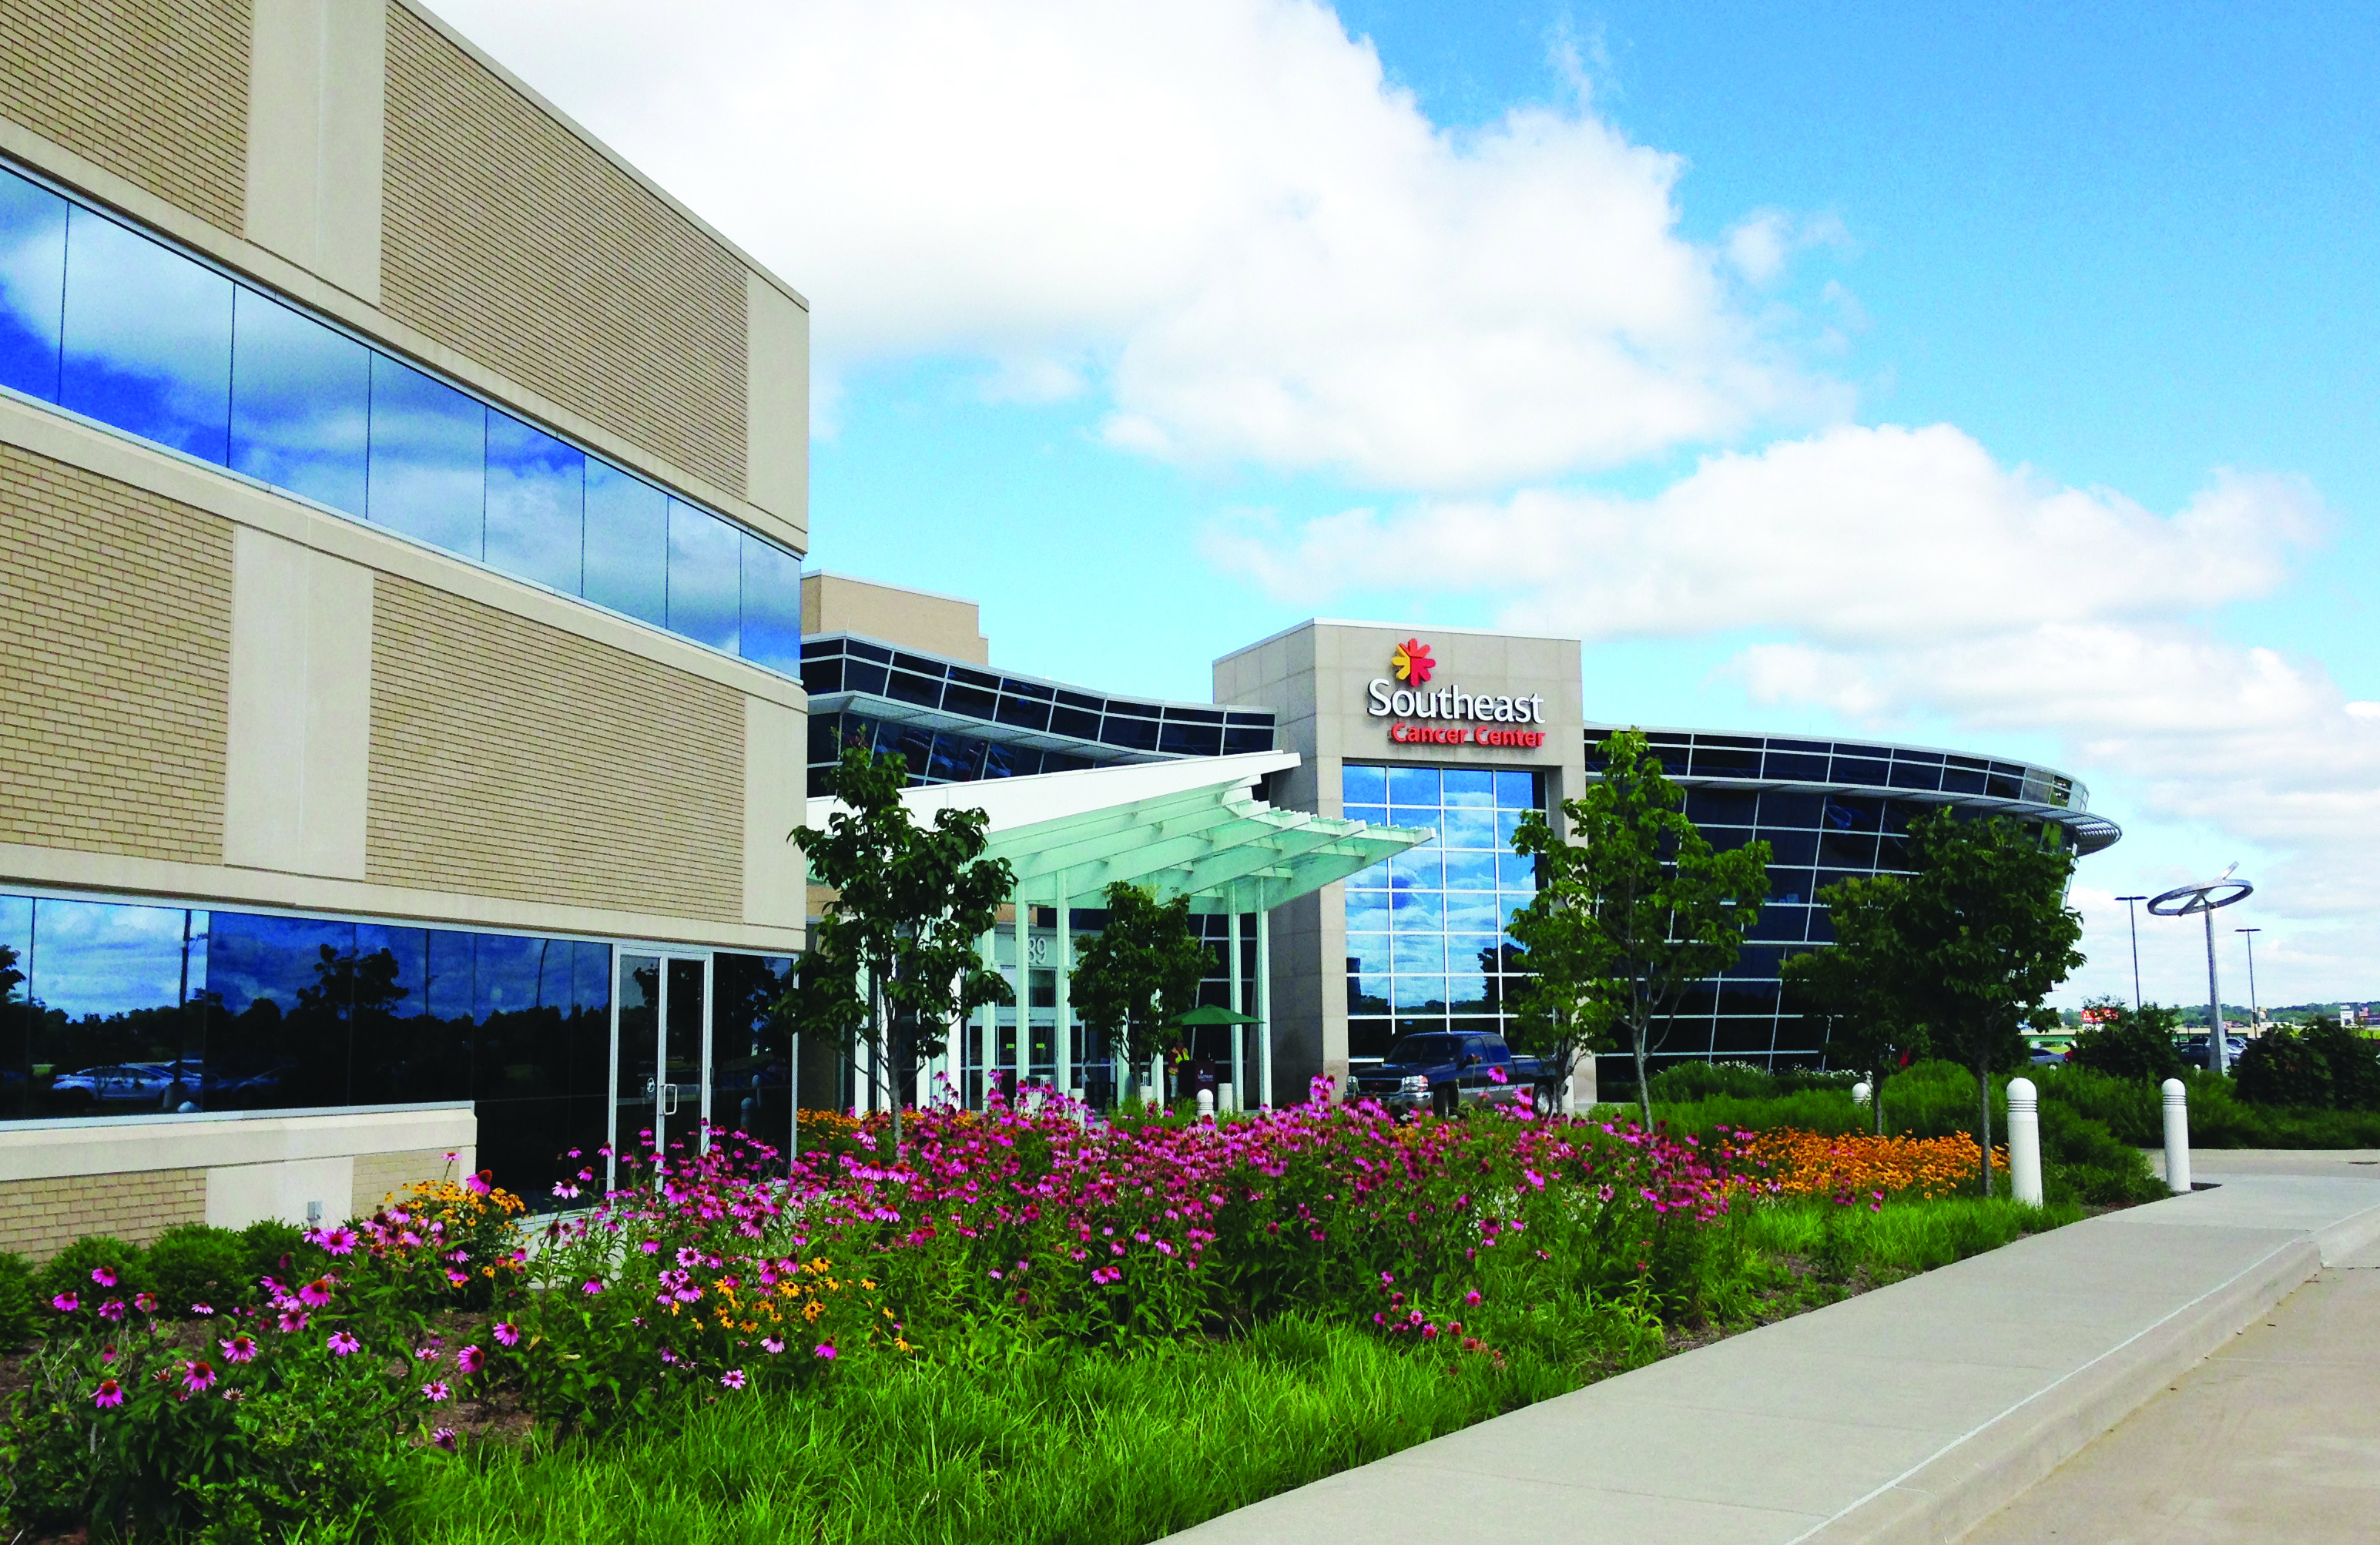 Southeast Cancer Center